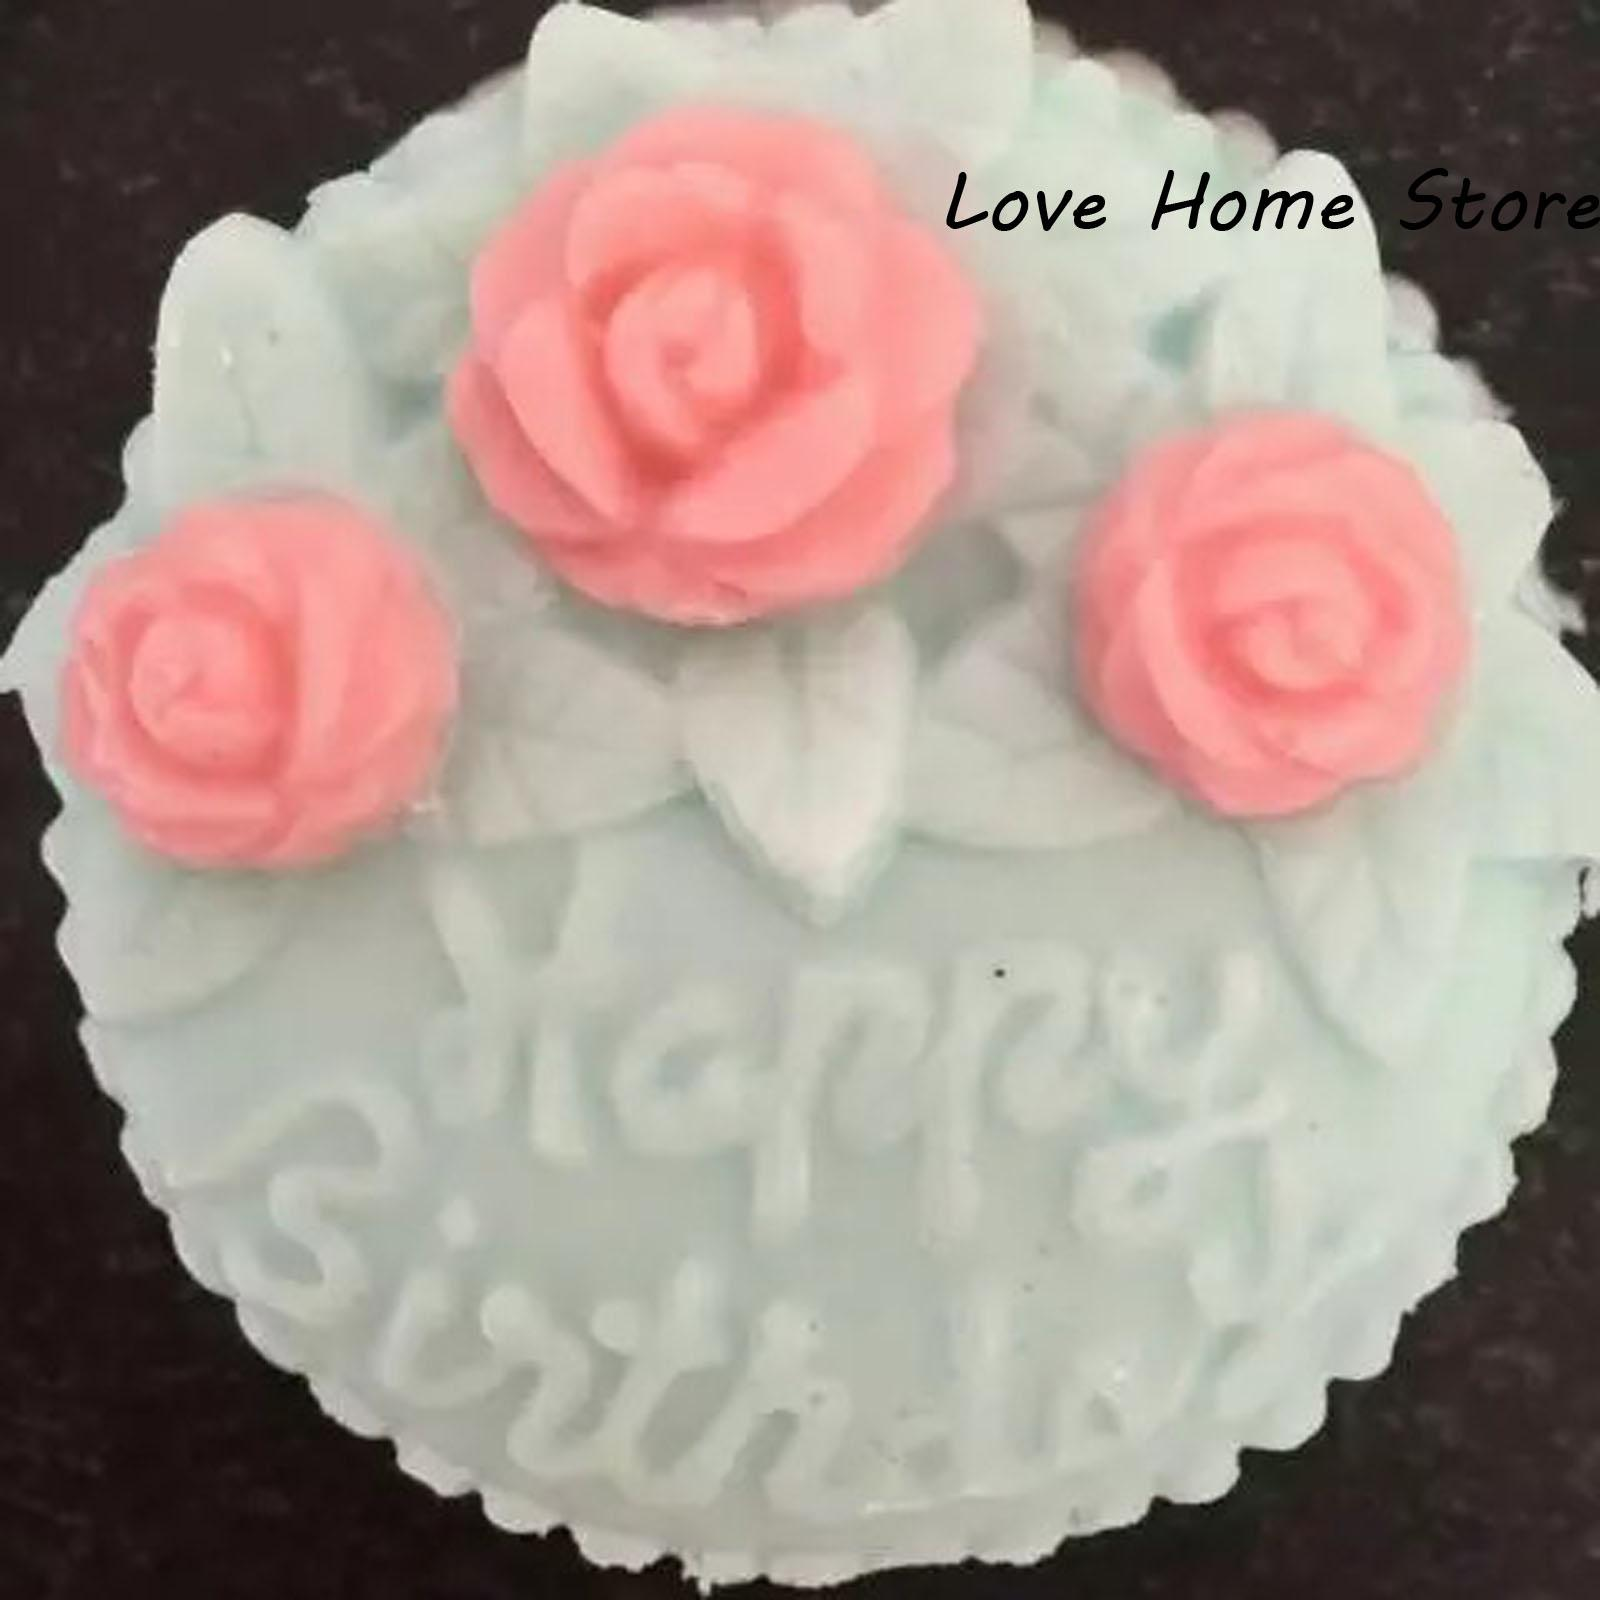 Strange 2020 Birthday Cake Design Silicone Cake Mold 3D Sugarcraft Jelly Personalised Birthday Cards Sponlily Jamesorg